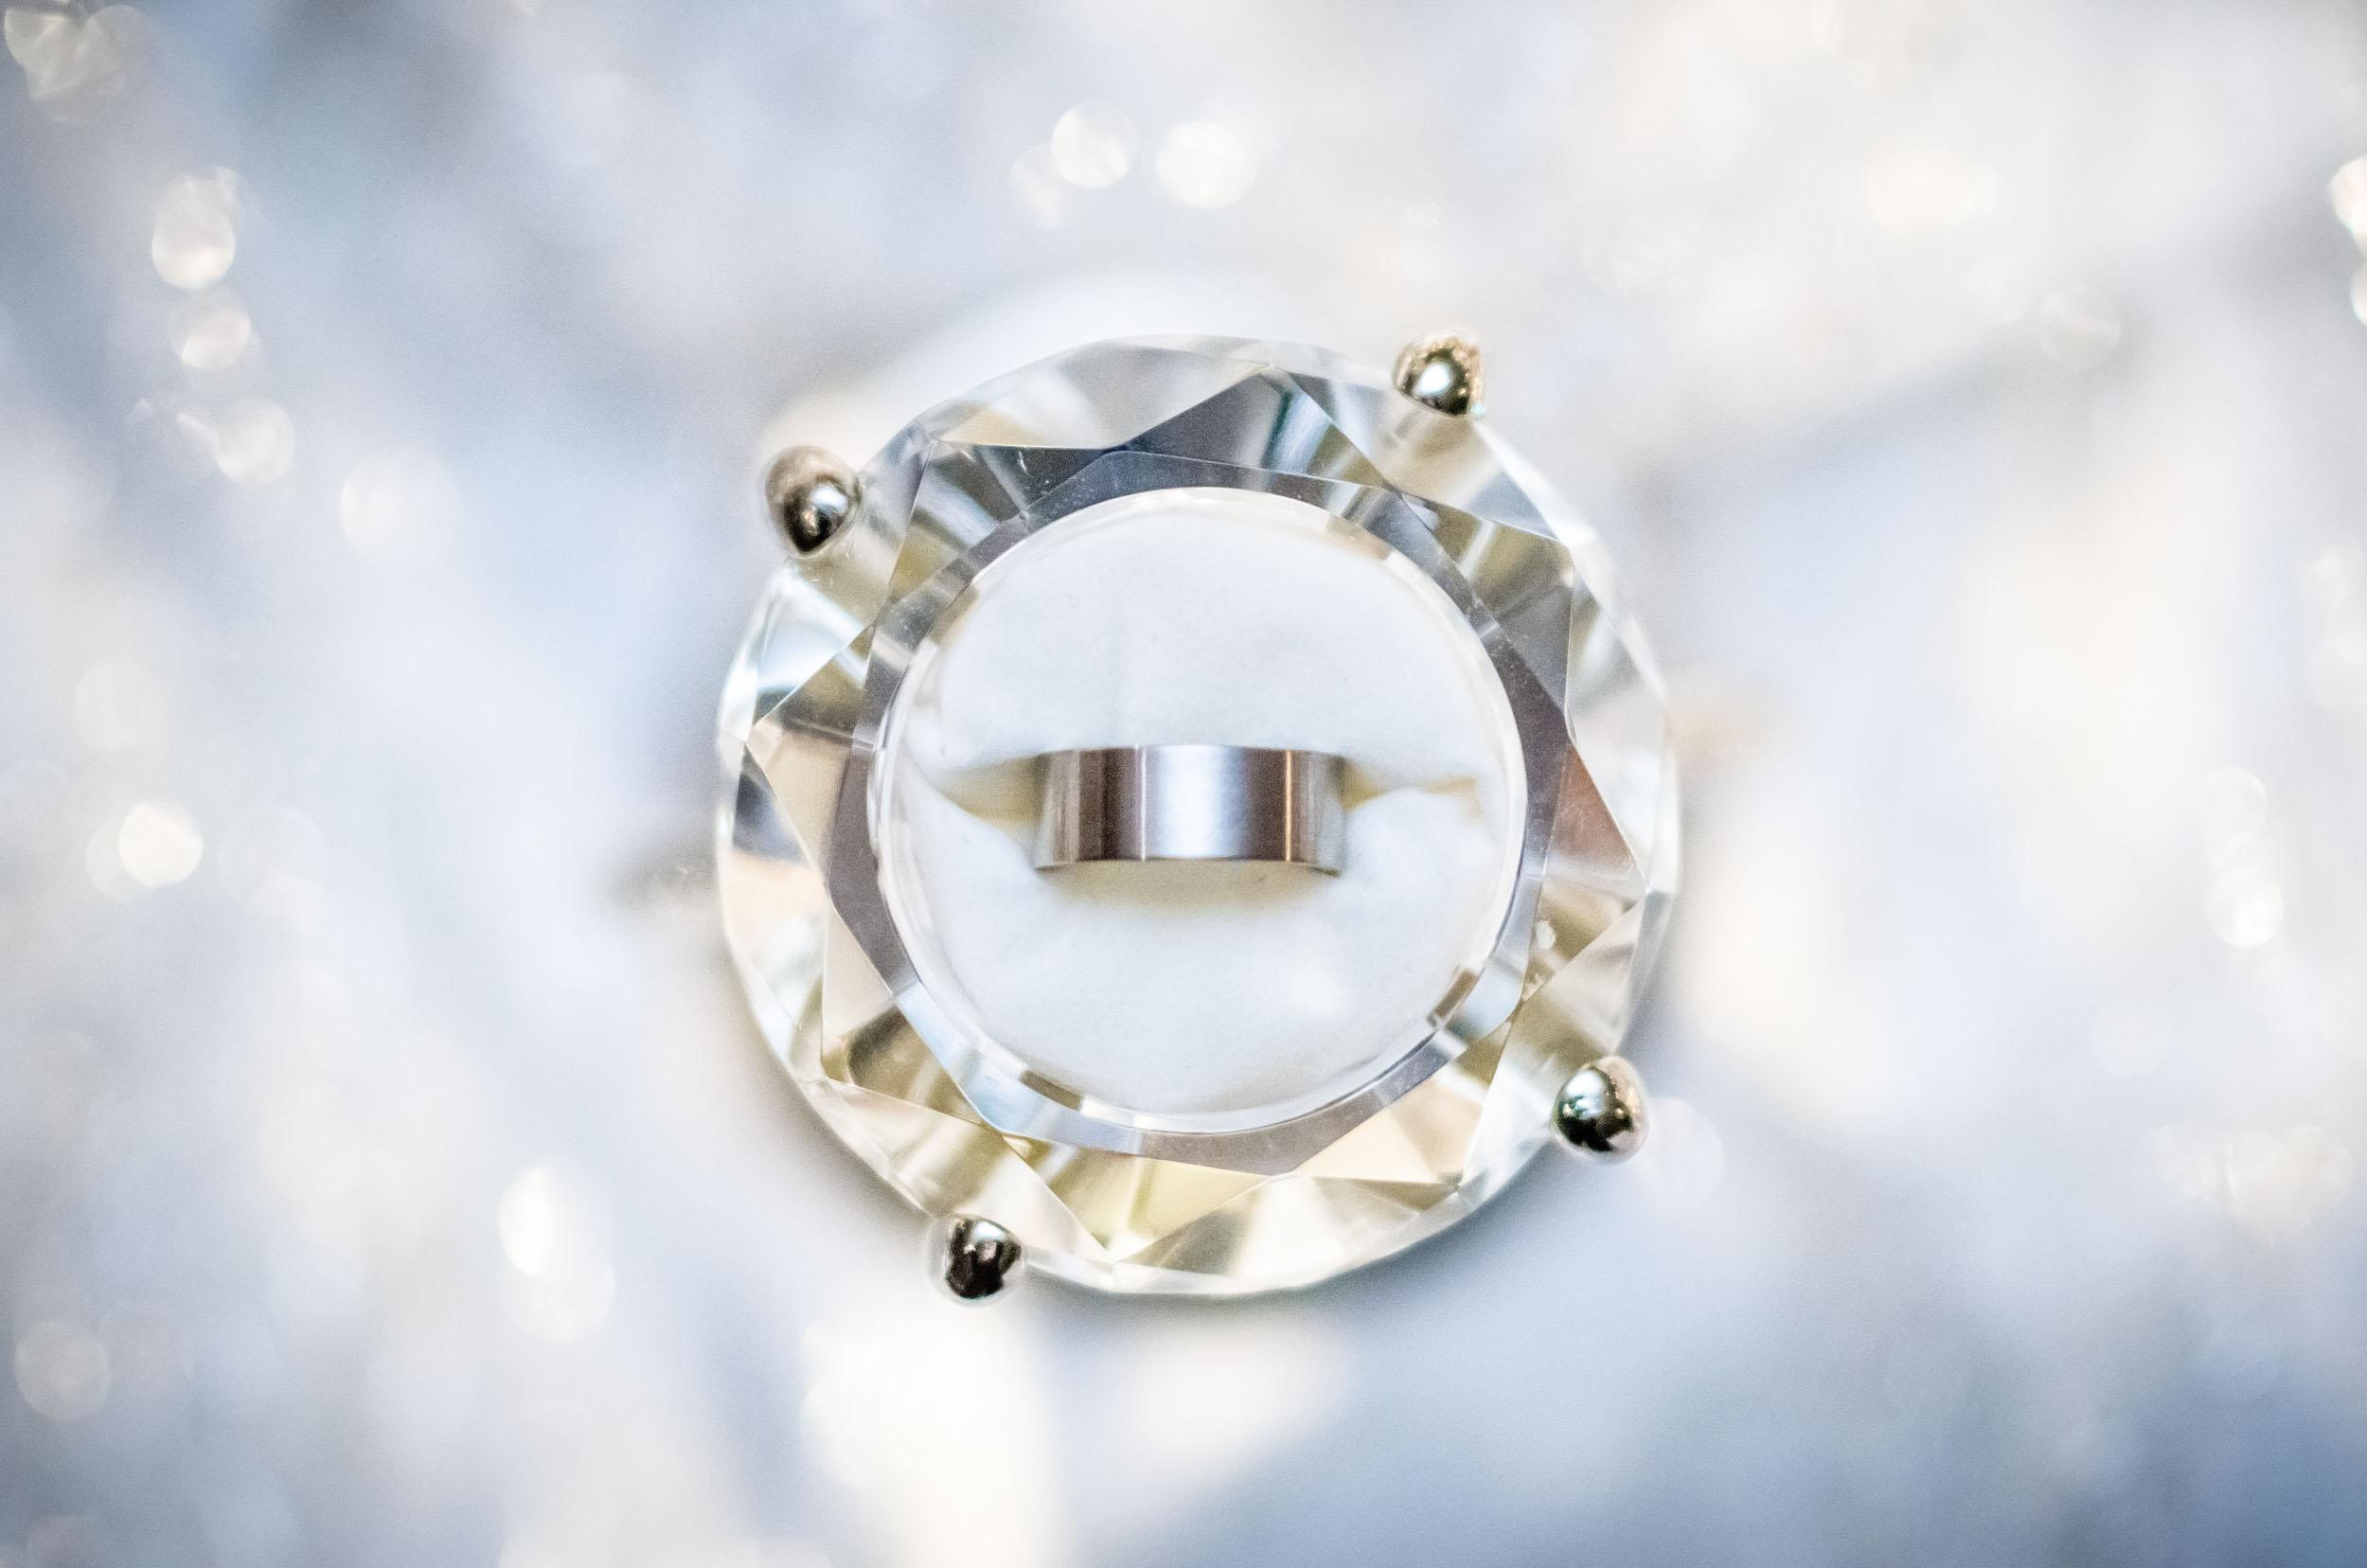 dc+metro+wedding+photographer+vadym+guliuk+photography+wedding+rings-2022.jpg